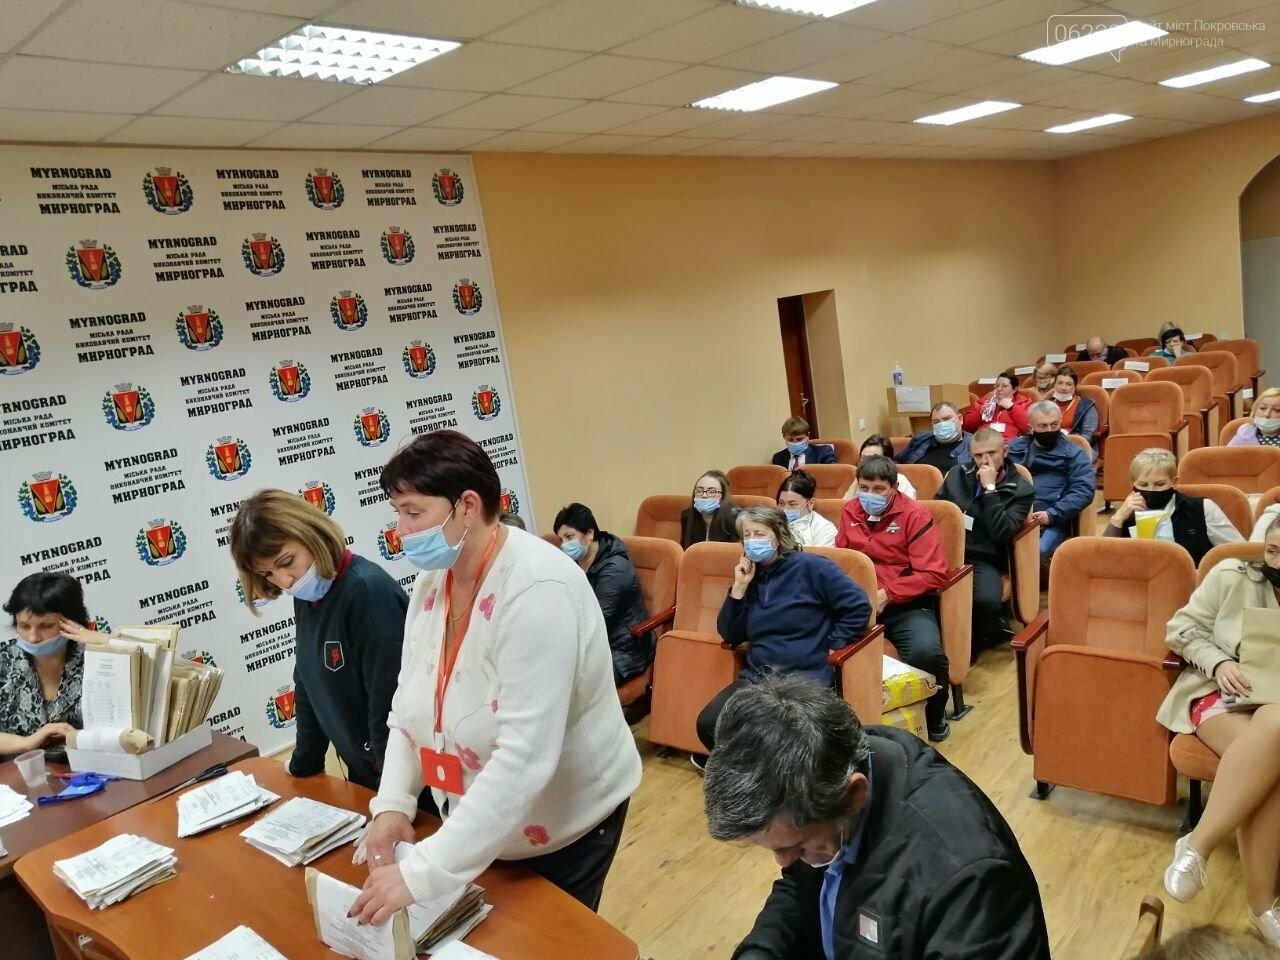 Мирноградская ТИК по состоянию на 18.00 получила бюллетени от 15 участков, фото-4